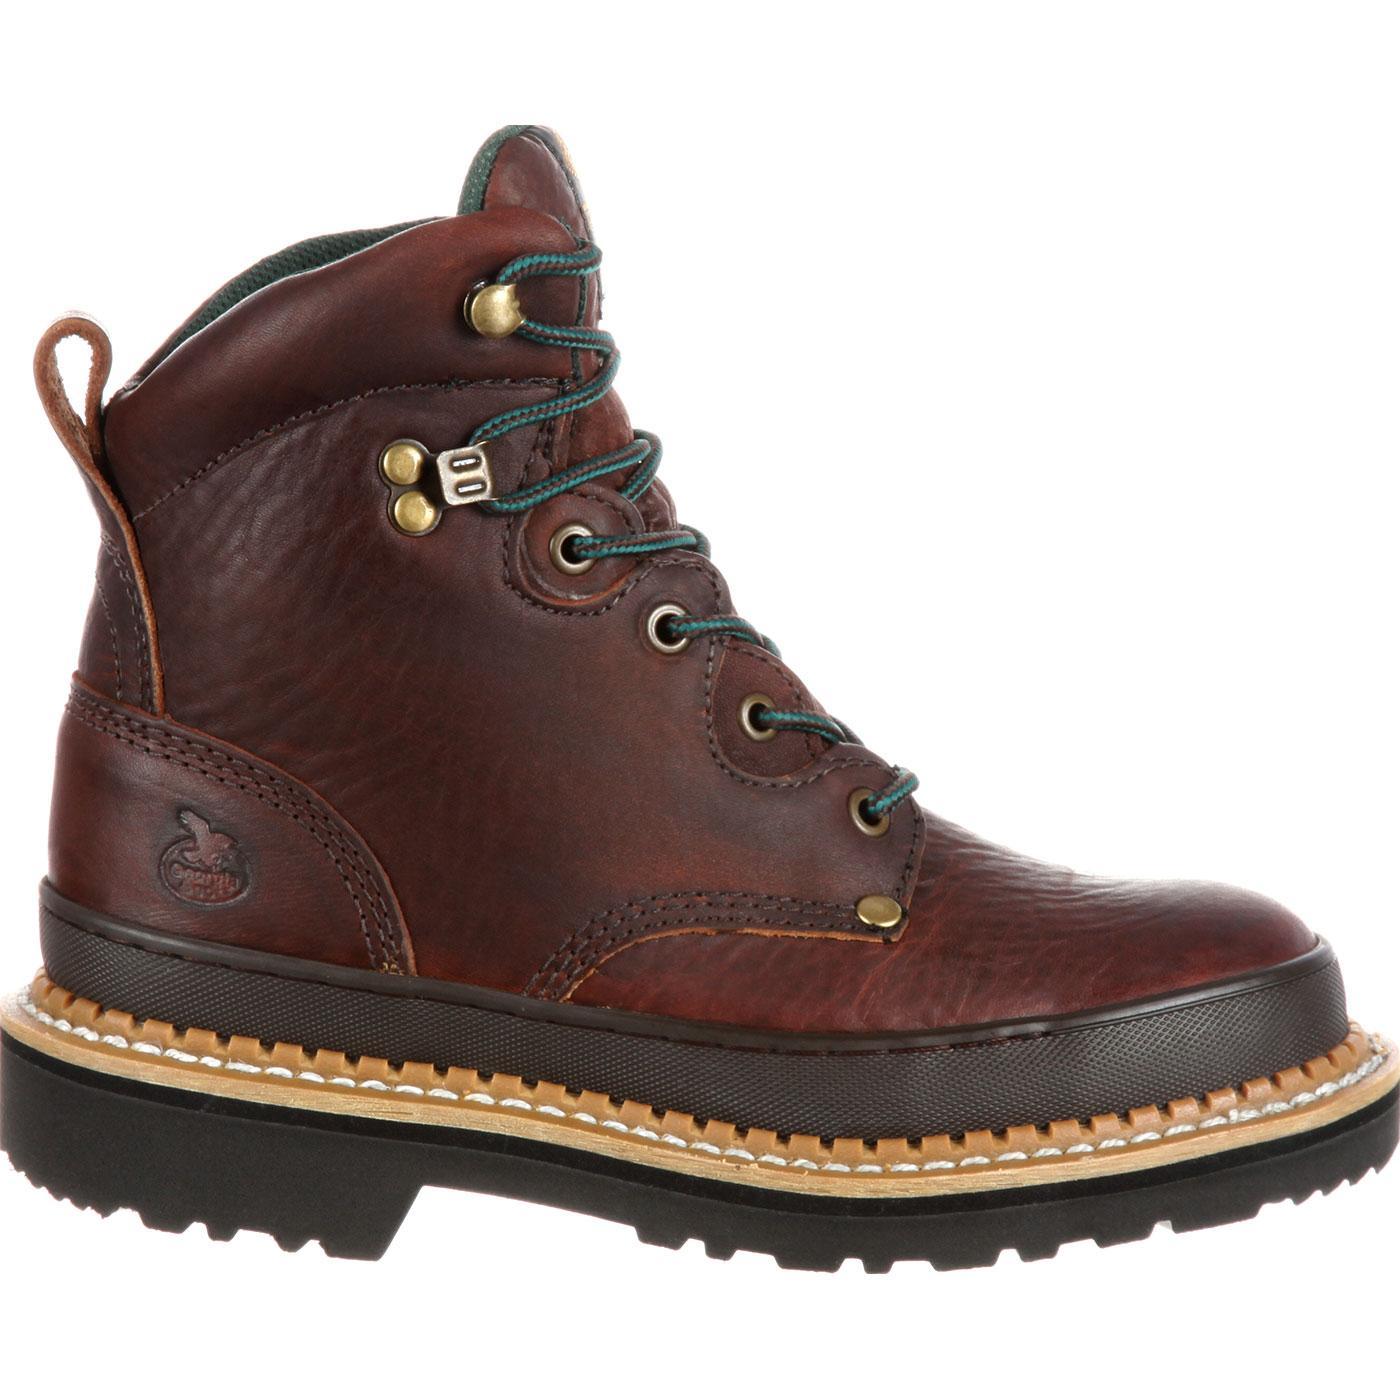 84573c31cec Georgia Giant Women's Steel Toe Work Boot